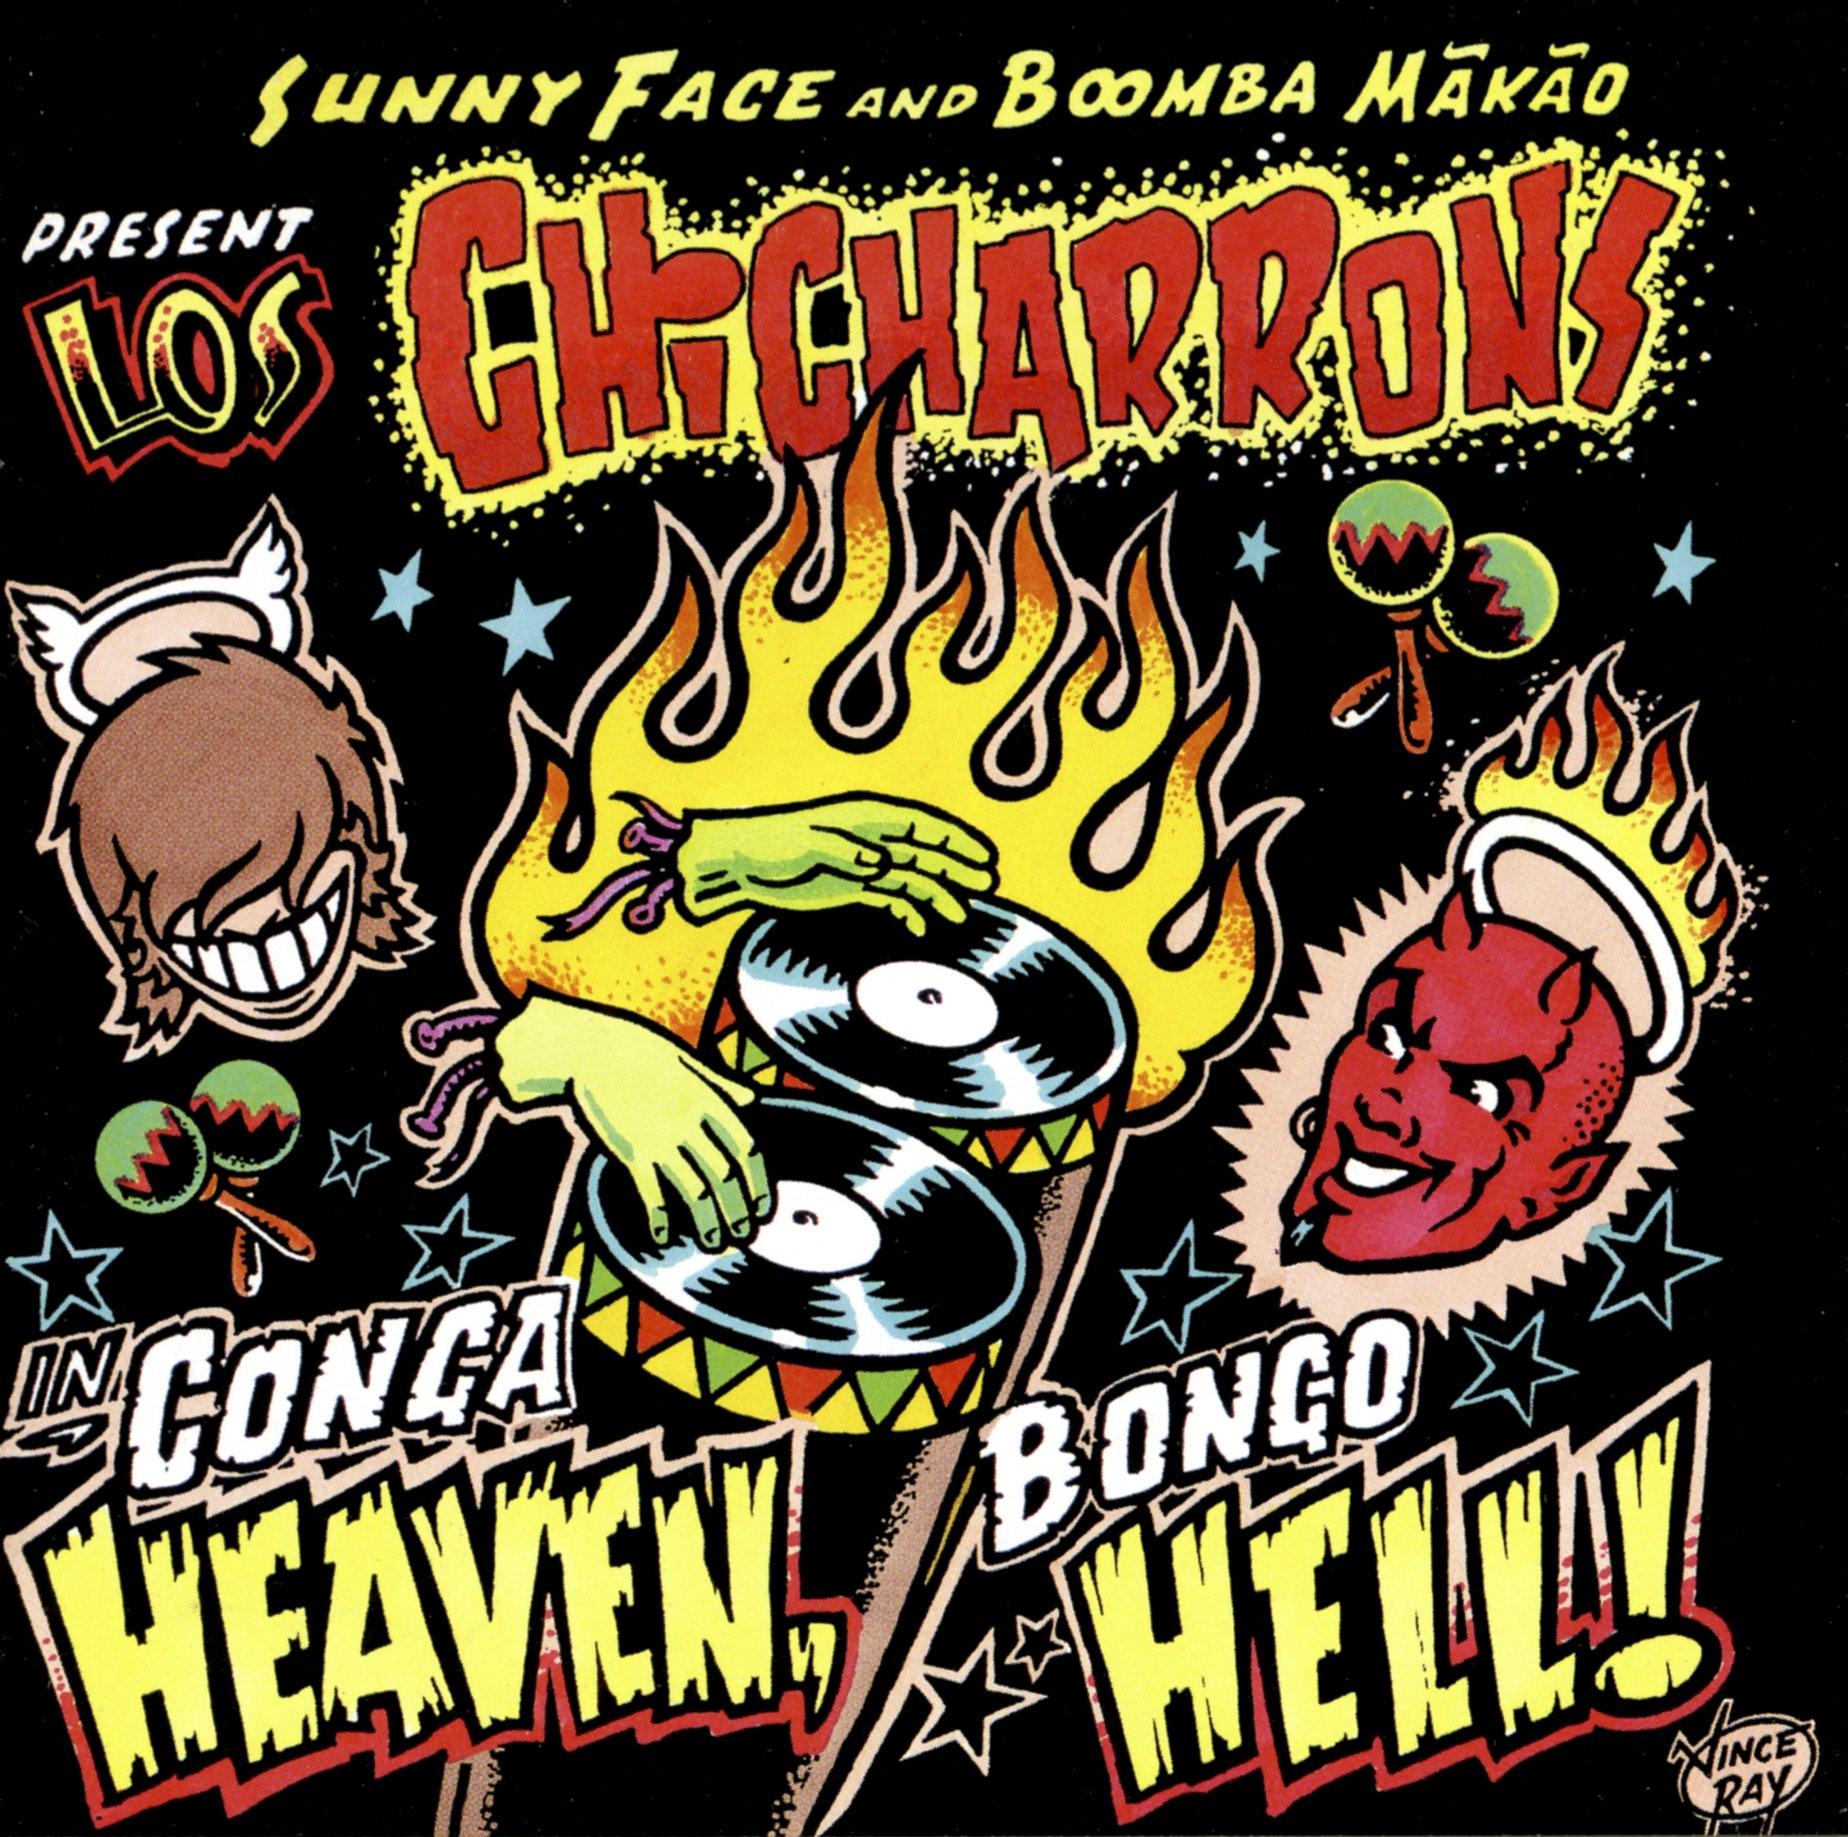 1999 - Los Chicharrons